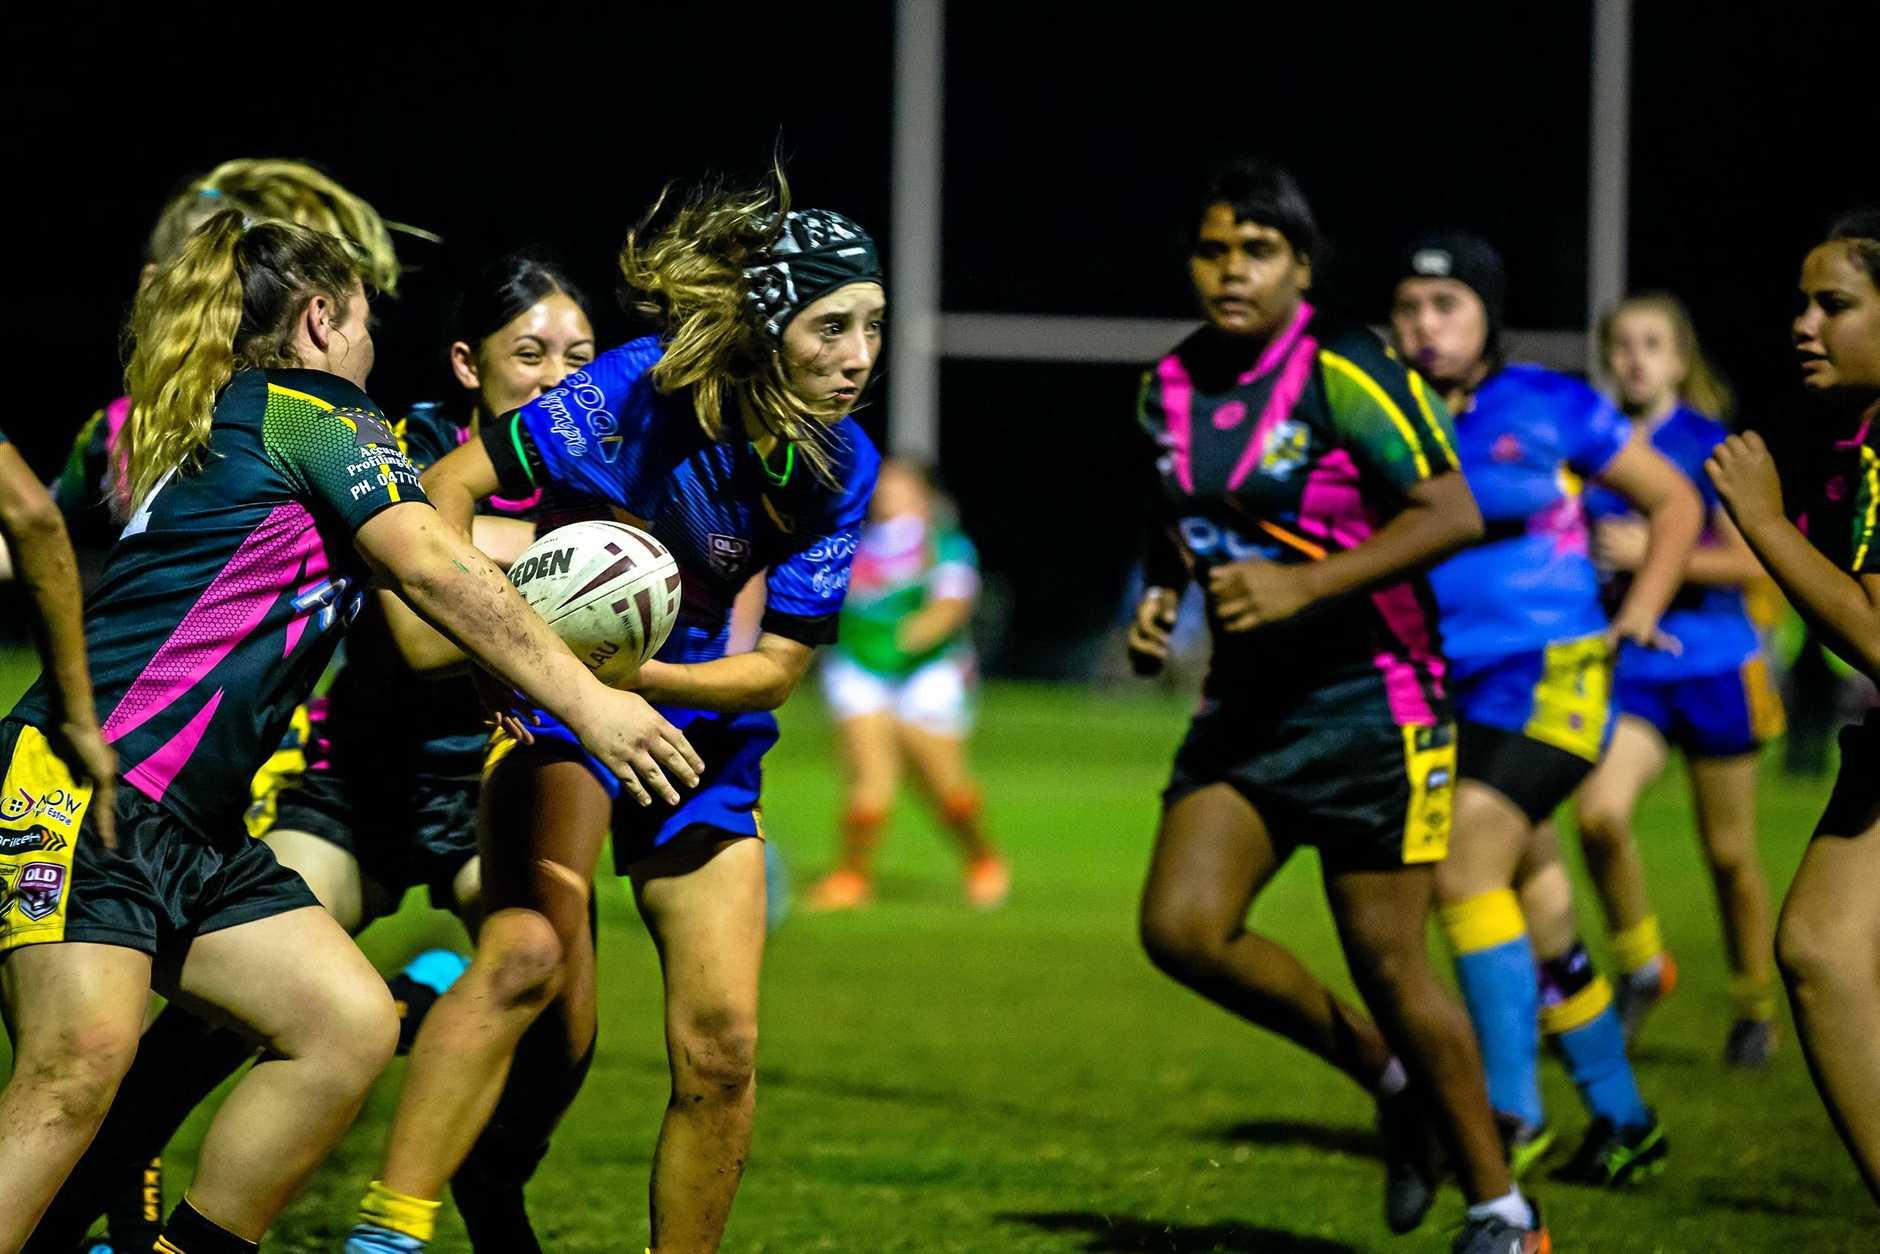 Junior Rugby League U/14 Girls - Gympie Devils vs Caboolture - Tia McLellan Gympie Devils